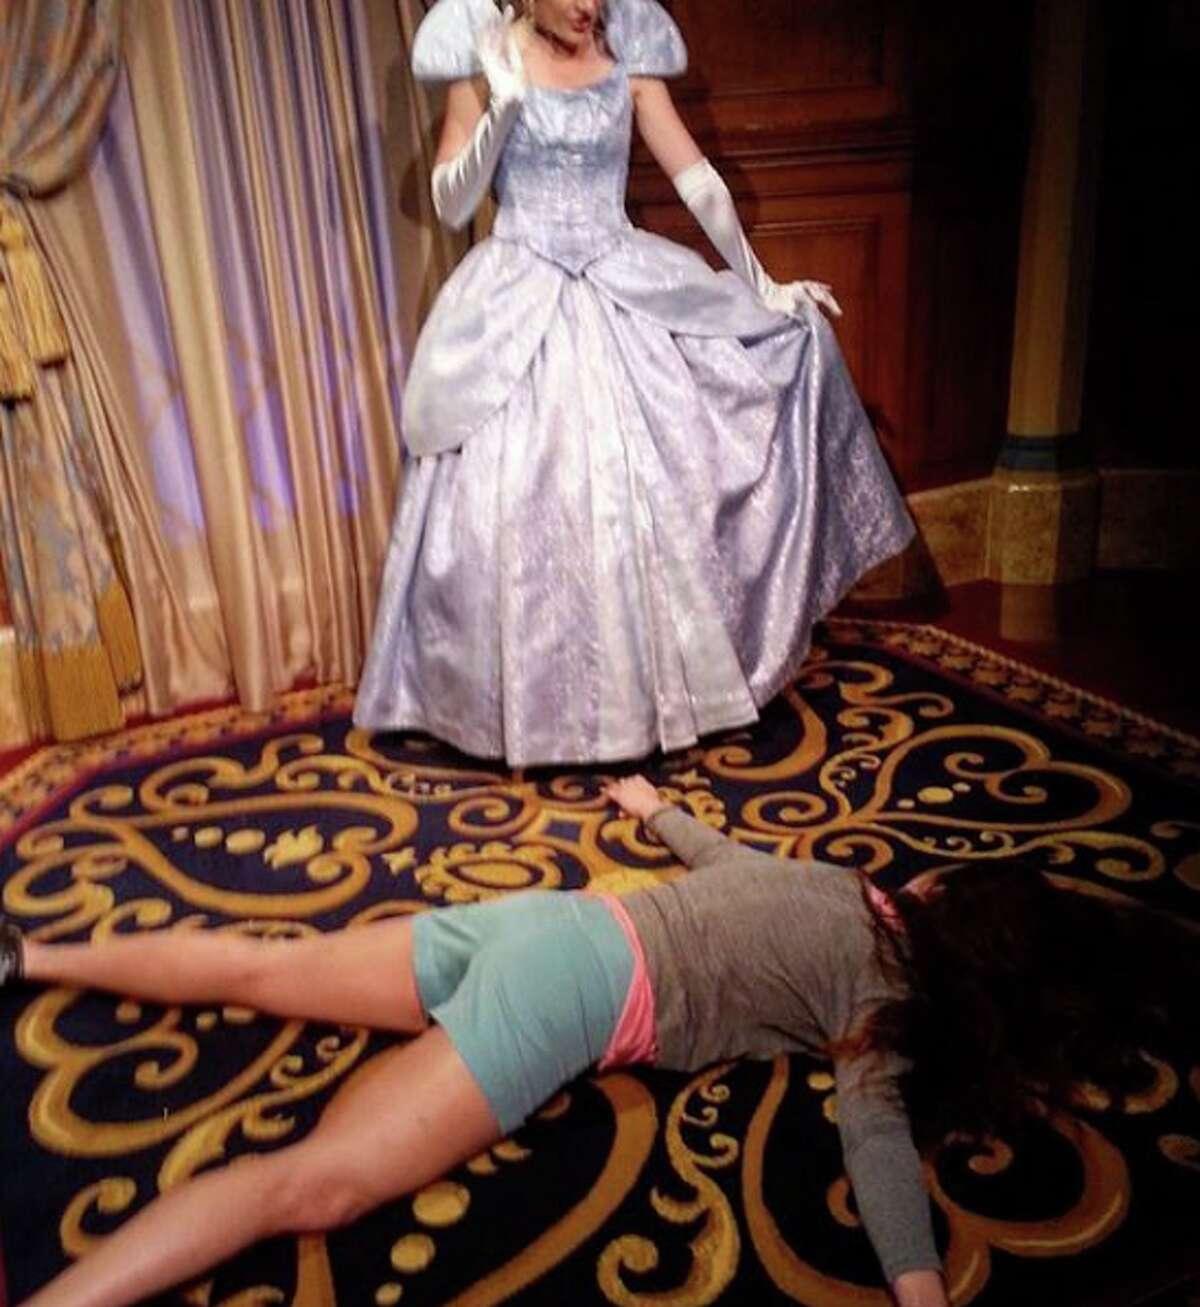 Expecting Prince Charming? At Walt Disney World in Orlando, Stephanie startles Cinderella. (Photo courtesy of Stephanie Leigh)